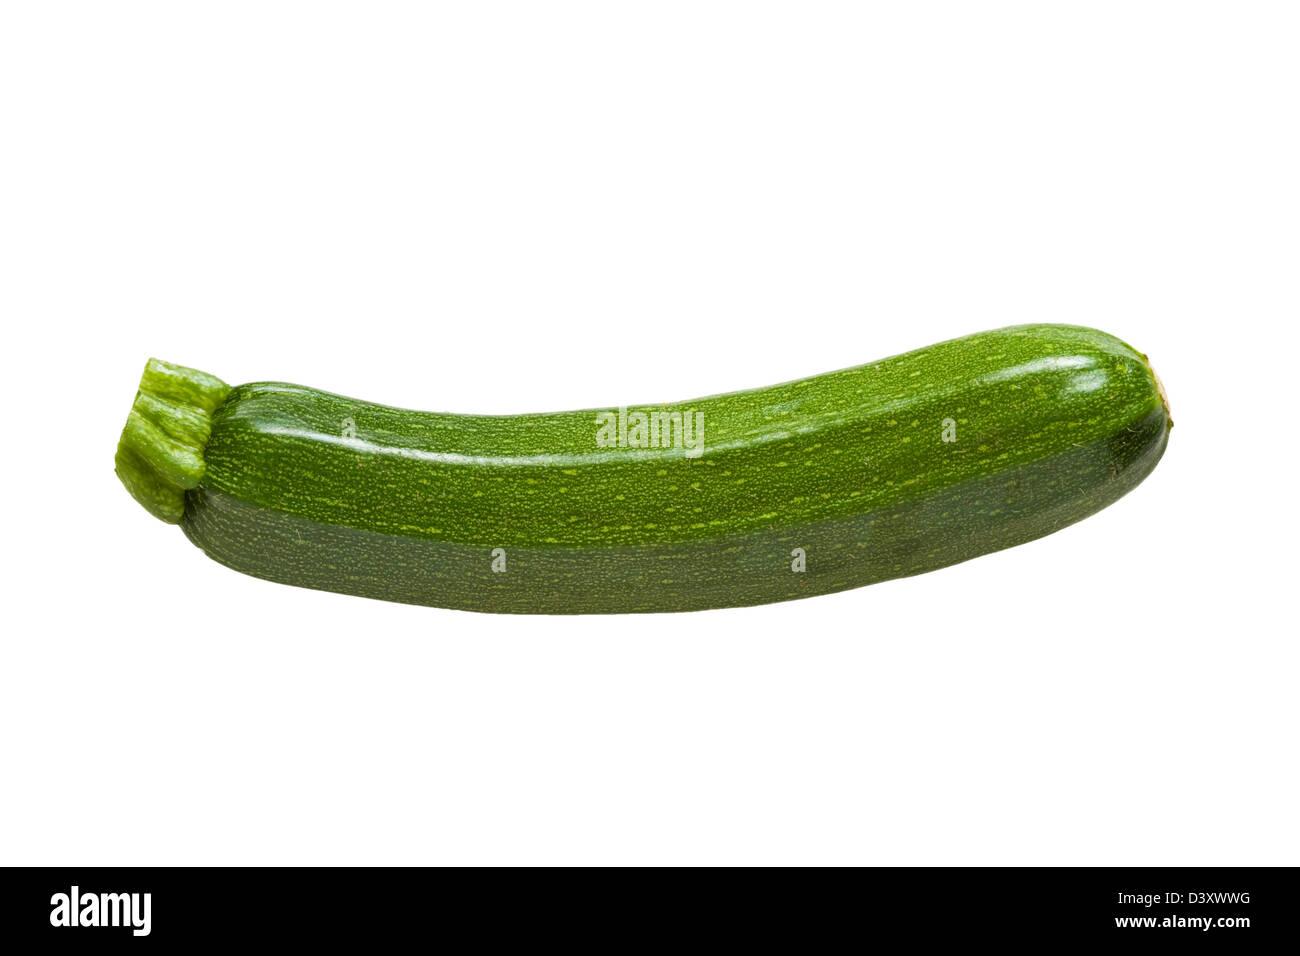 Calabacín (zucchini). Imagen De Stock